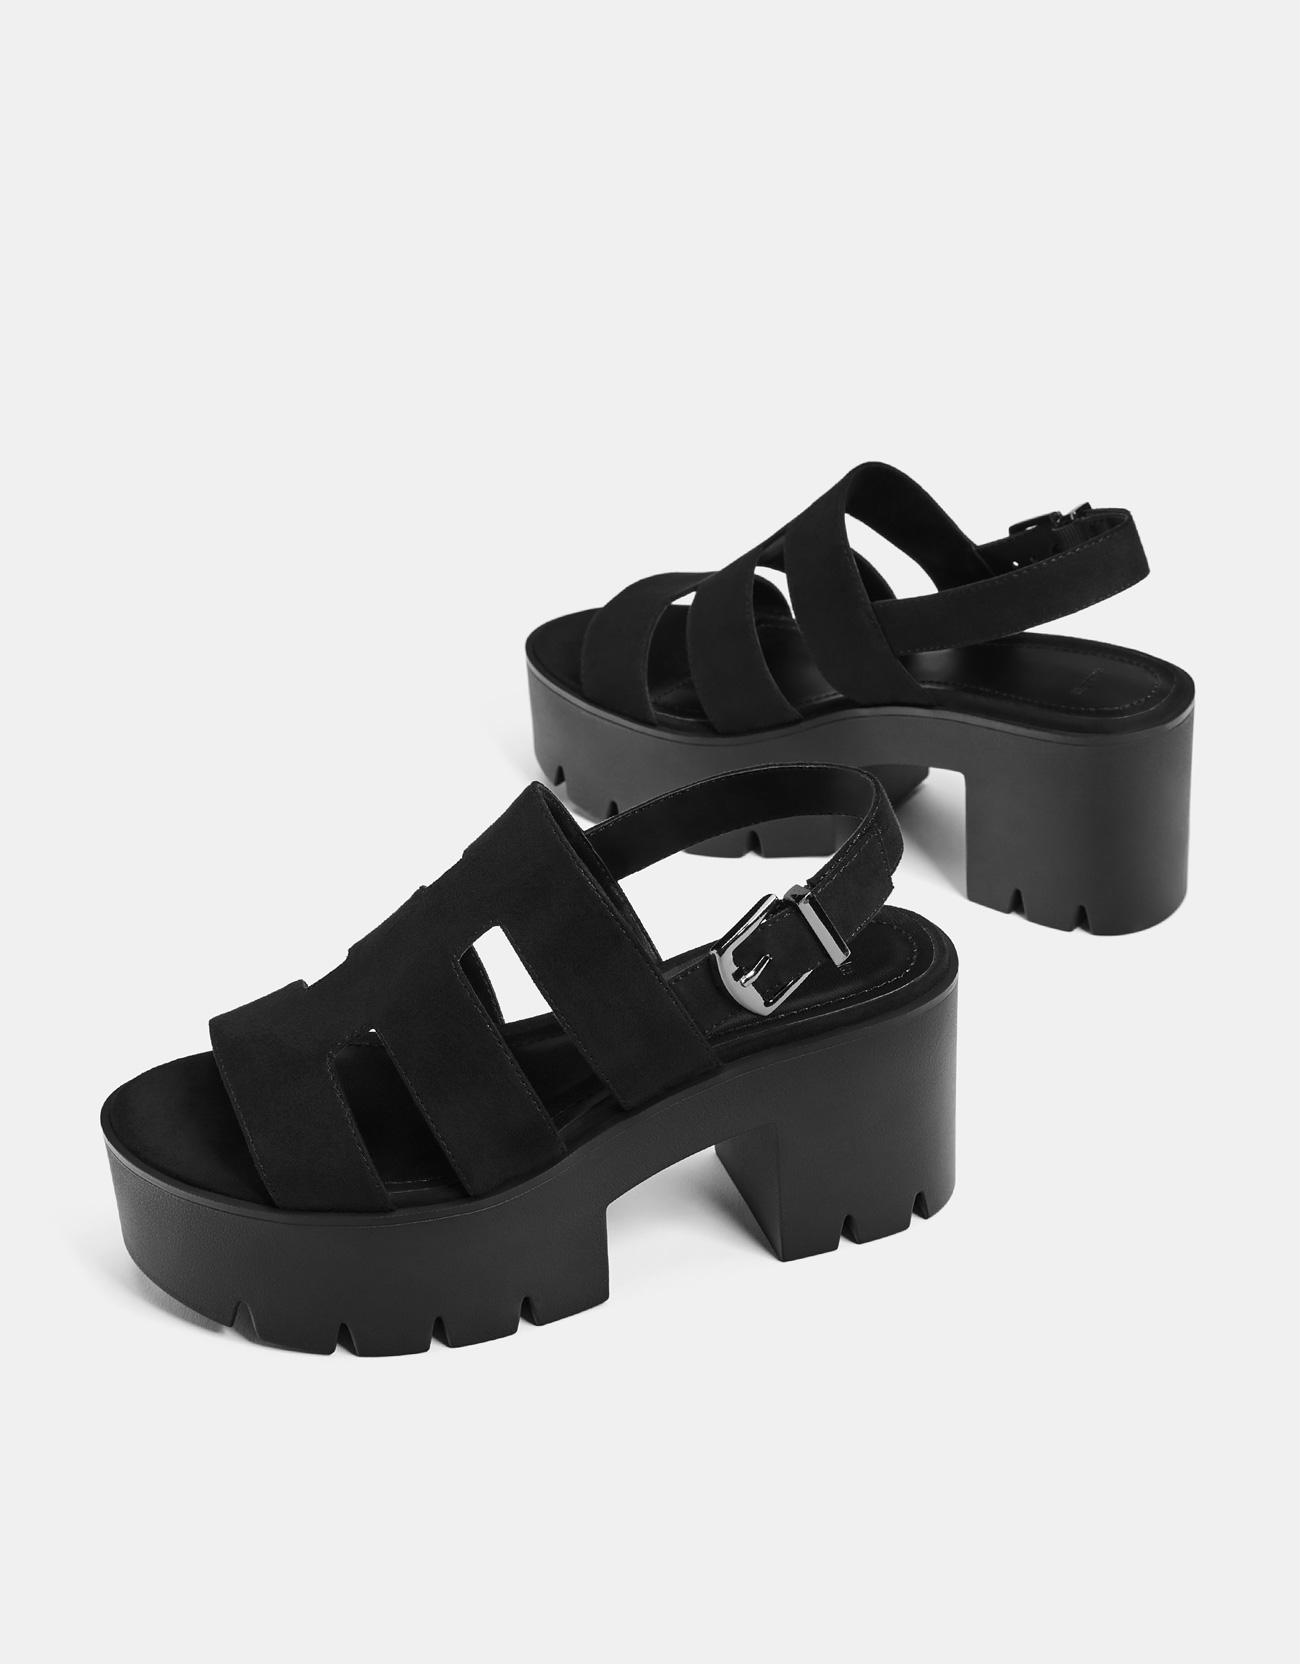 2d8f7049b272 Strappy platform sandals - SHOES - Bershka Armenia